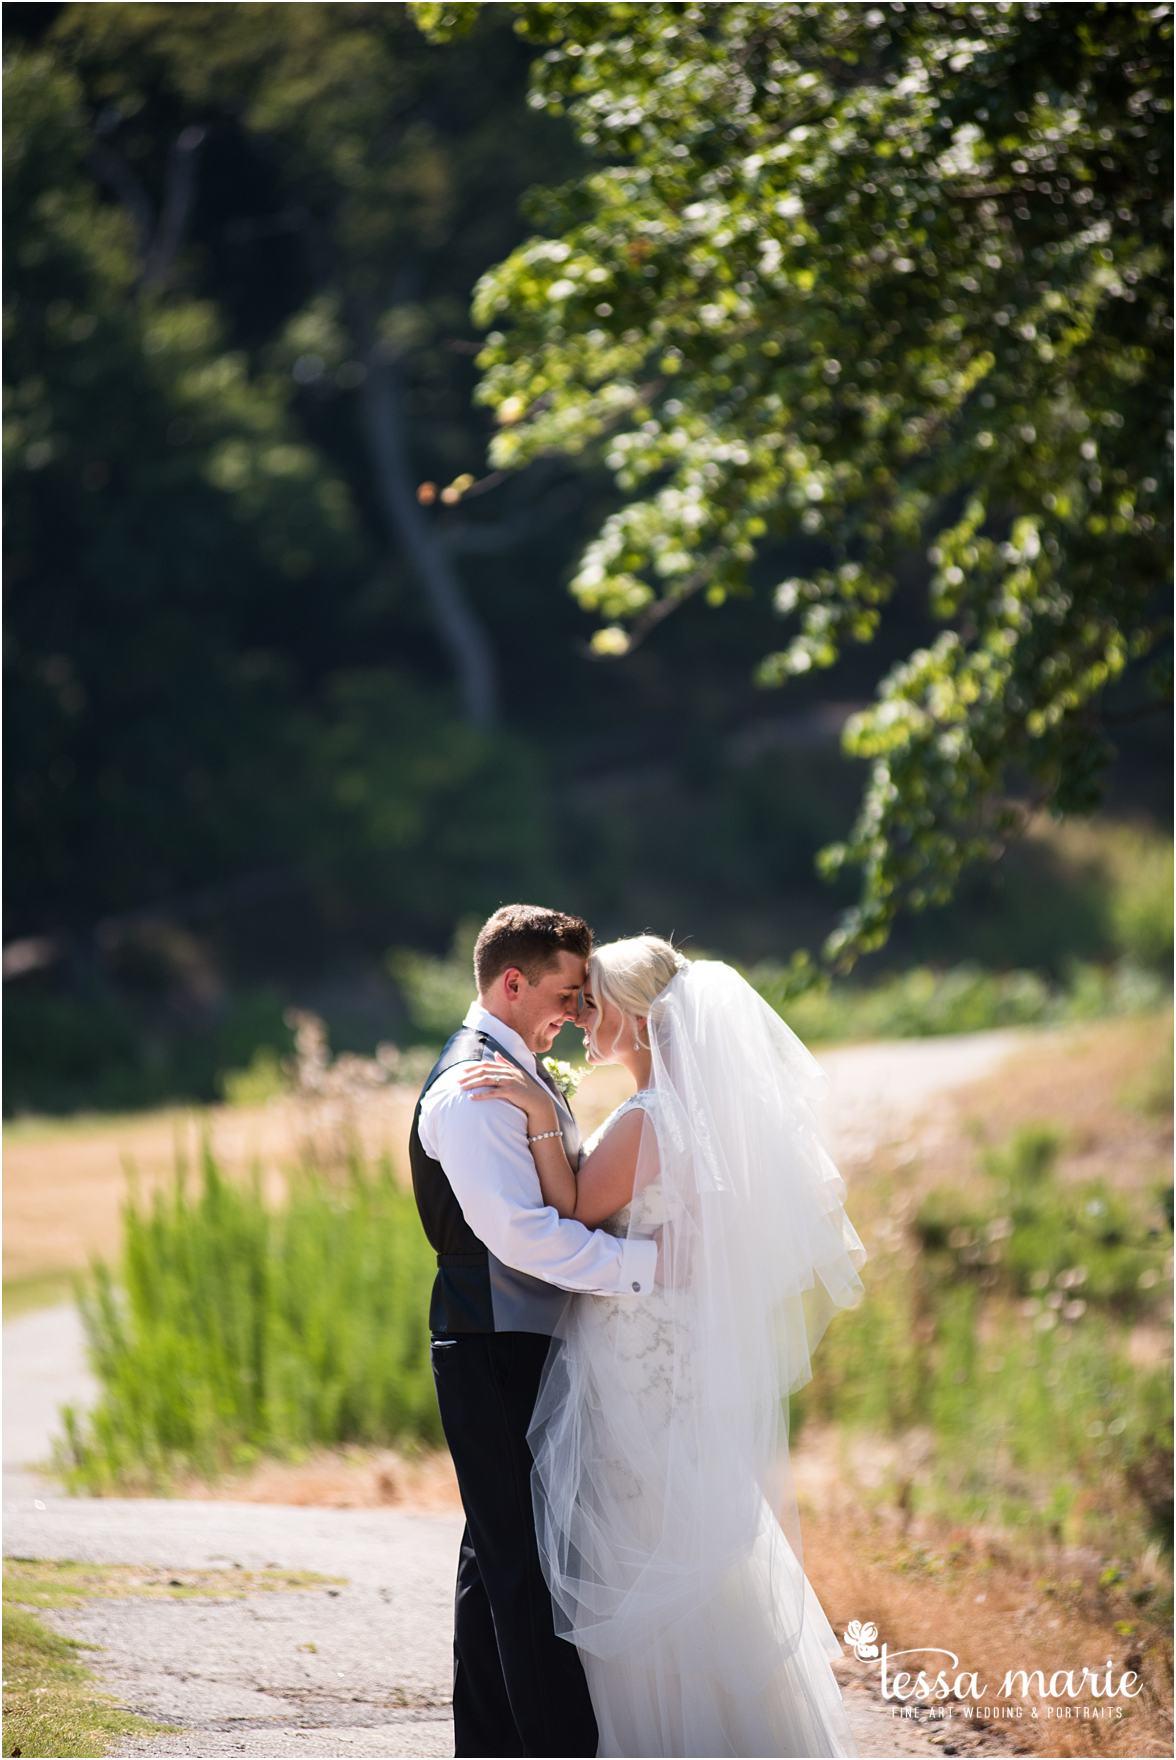 lake_lanier_wedding_summer_pictures_legacy_moments_family_candid_atlantas_best_wedding_photographer_tessa_marie_weddings_lake_lanier_bride_out_door_wedding_0146